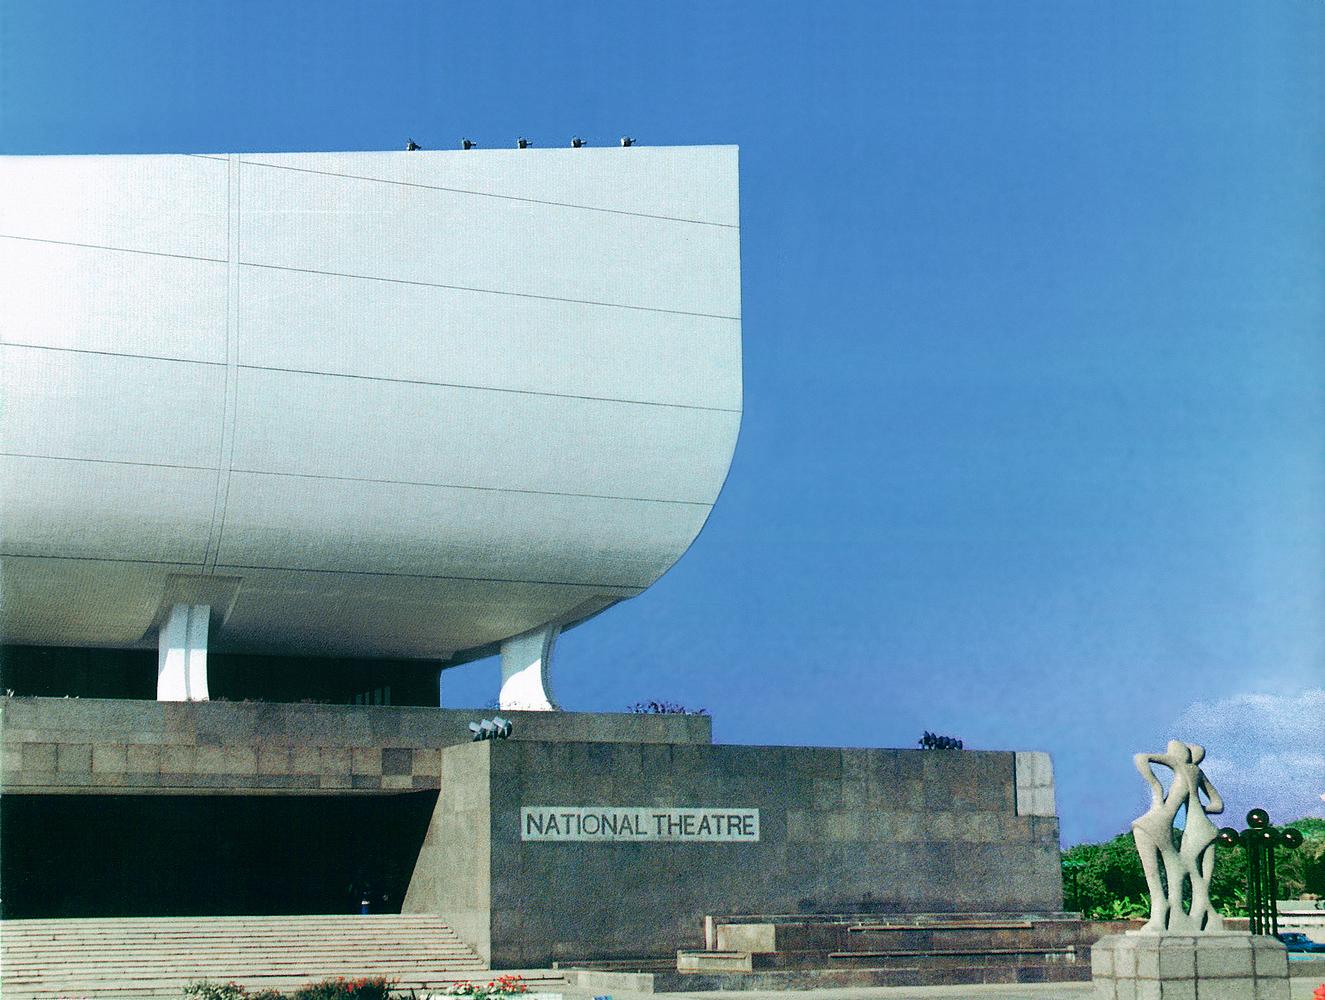 Gallery of ghana national theatre cctn design also new mkt rh pinterest